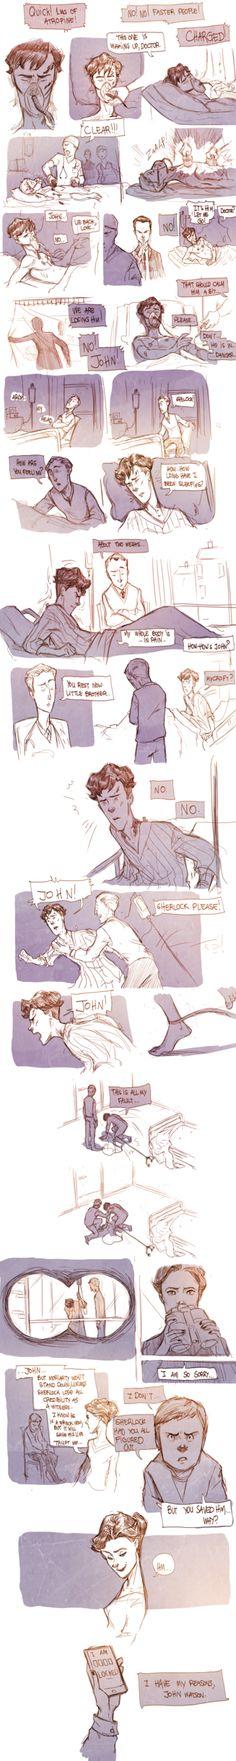 Teen Sherlock-Irene Pt5 by DrSlug on deviantART (this murders my soul)